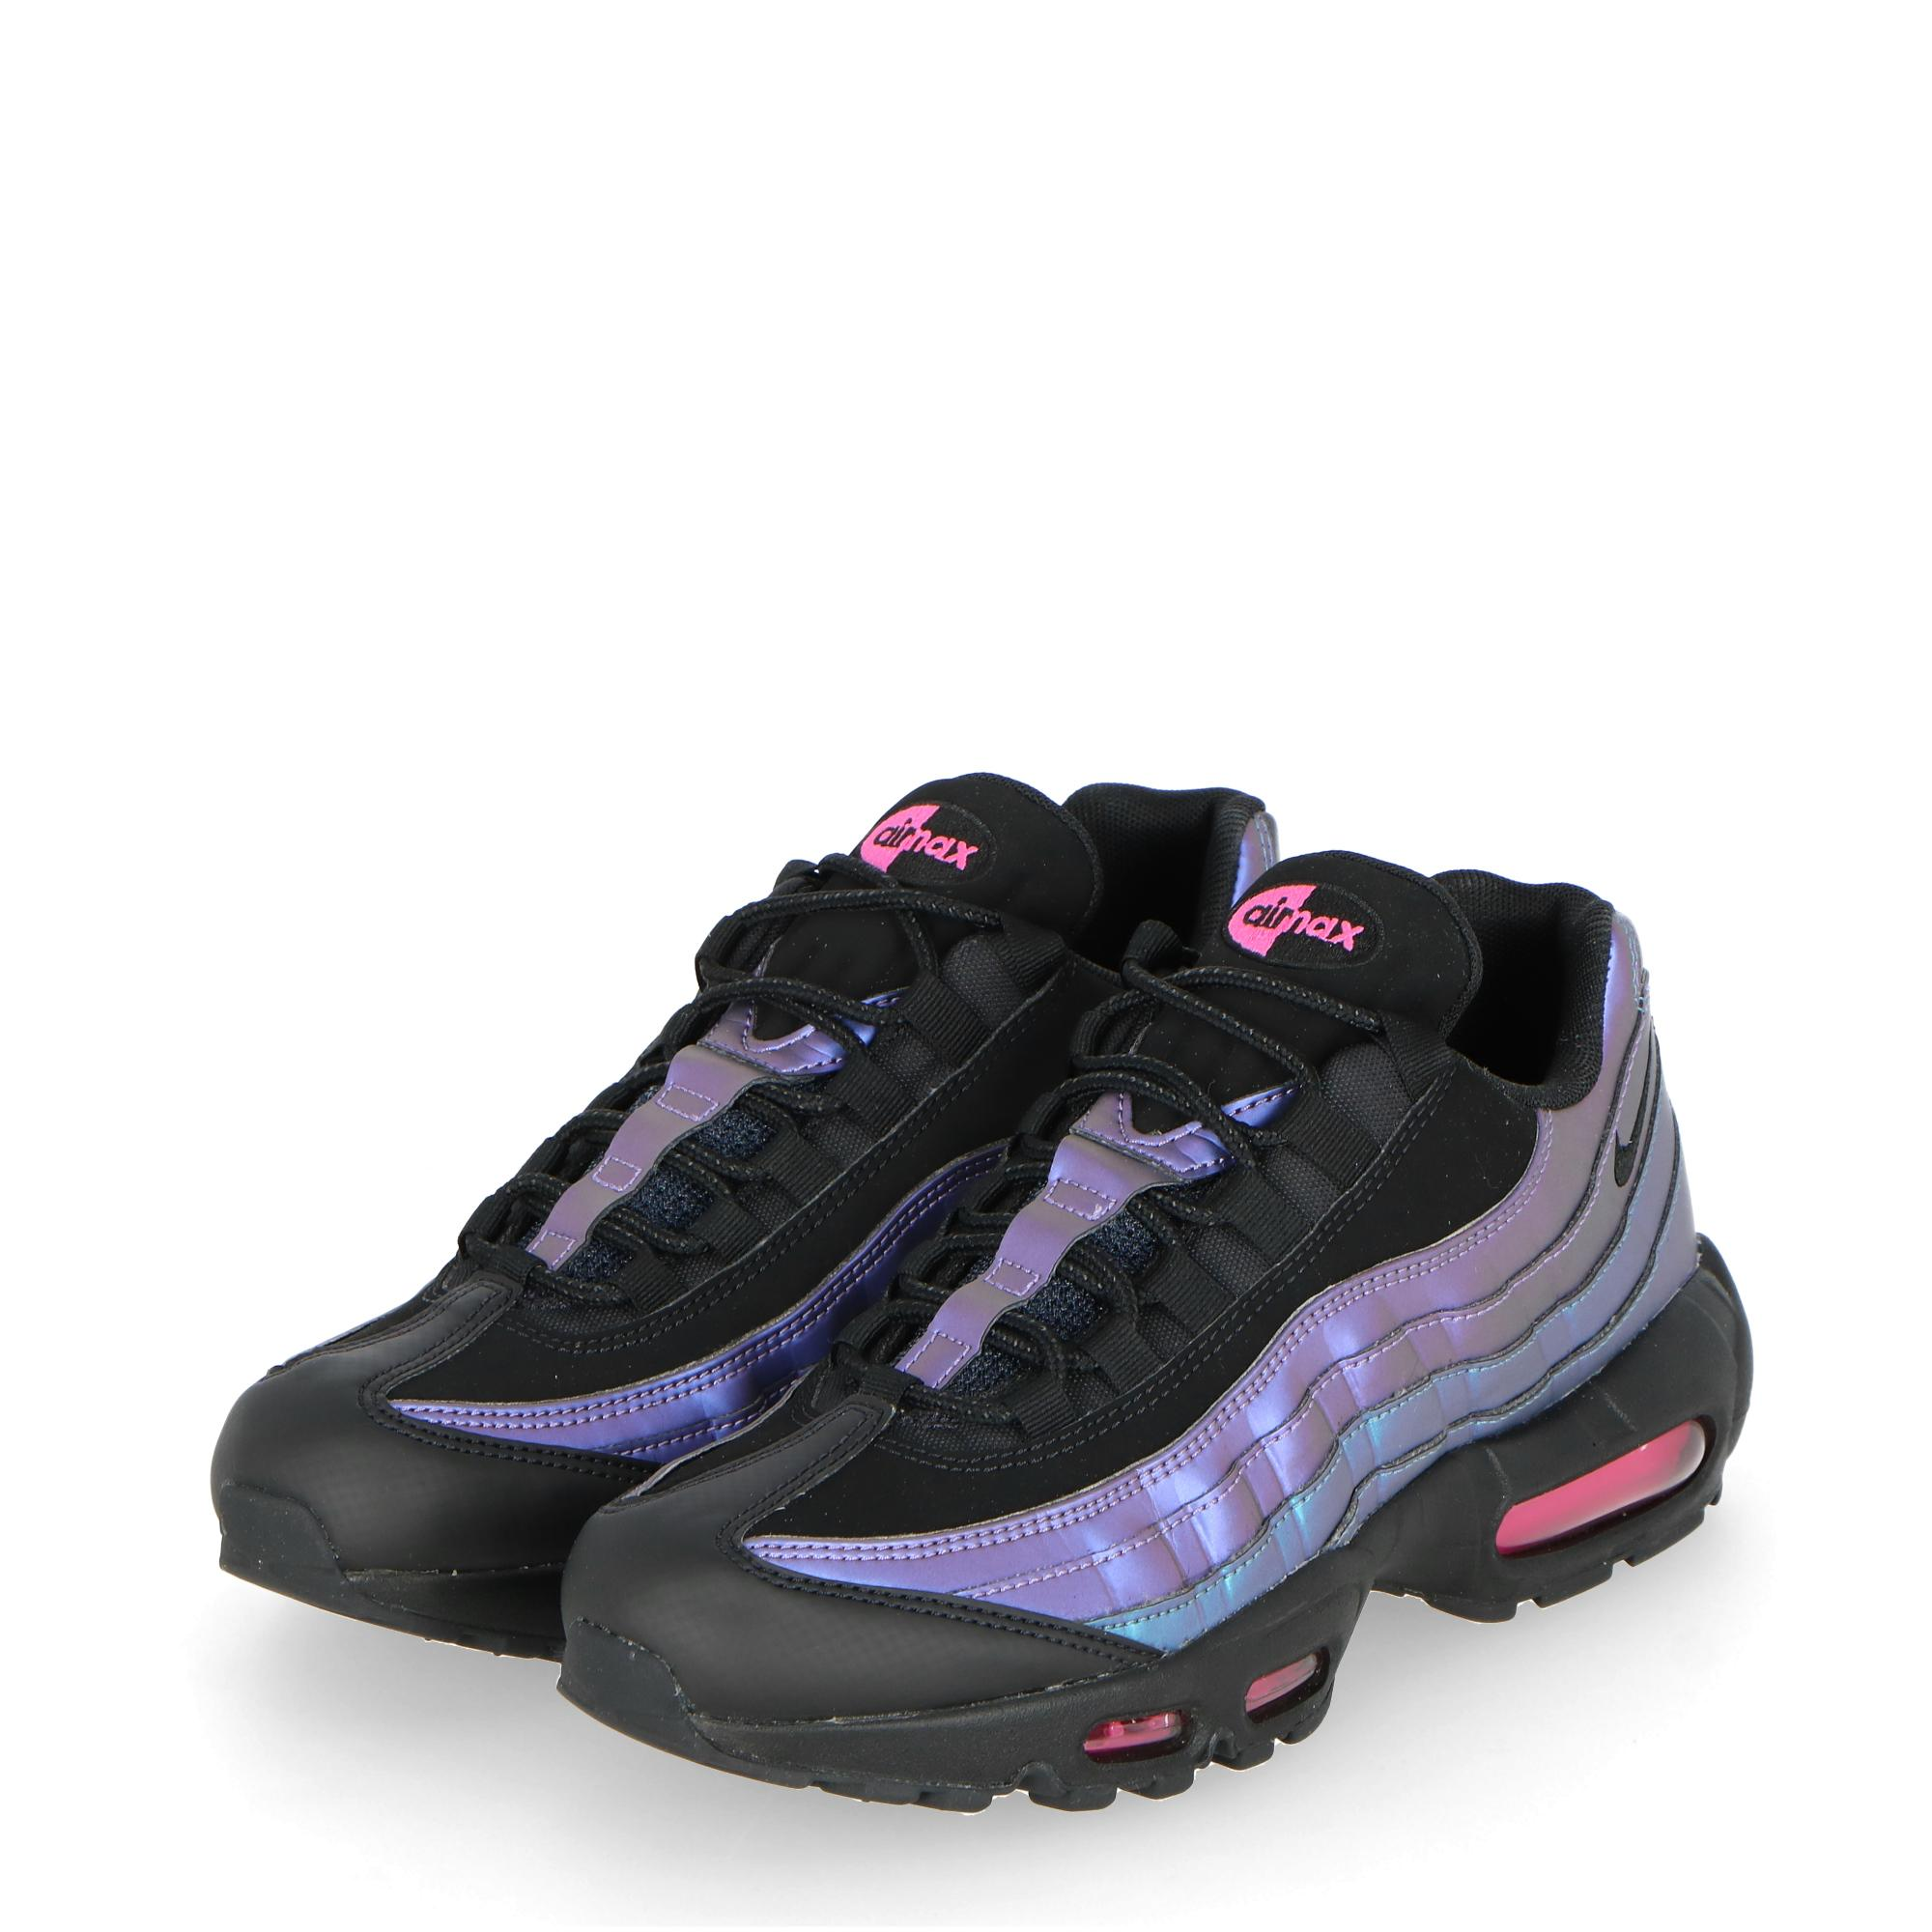 separation shoes ec9d9 a17ef NIKE AIR MAX 95 PREMIUM